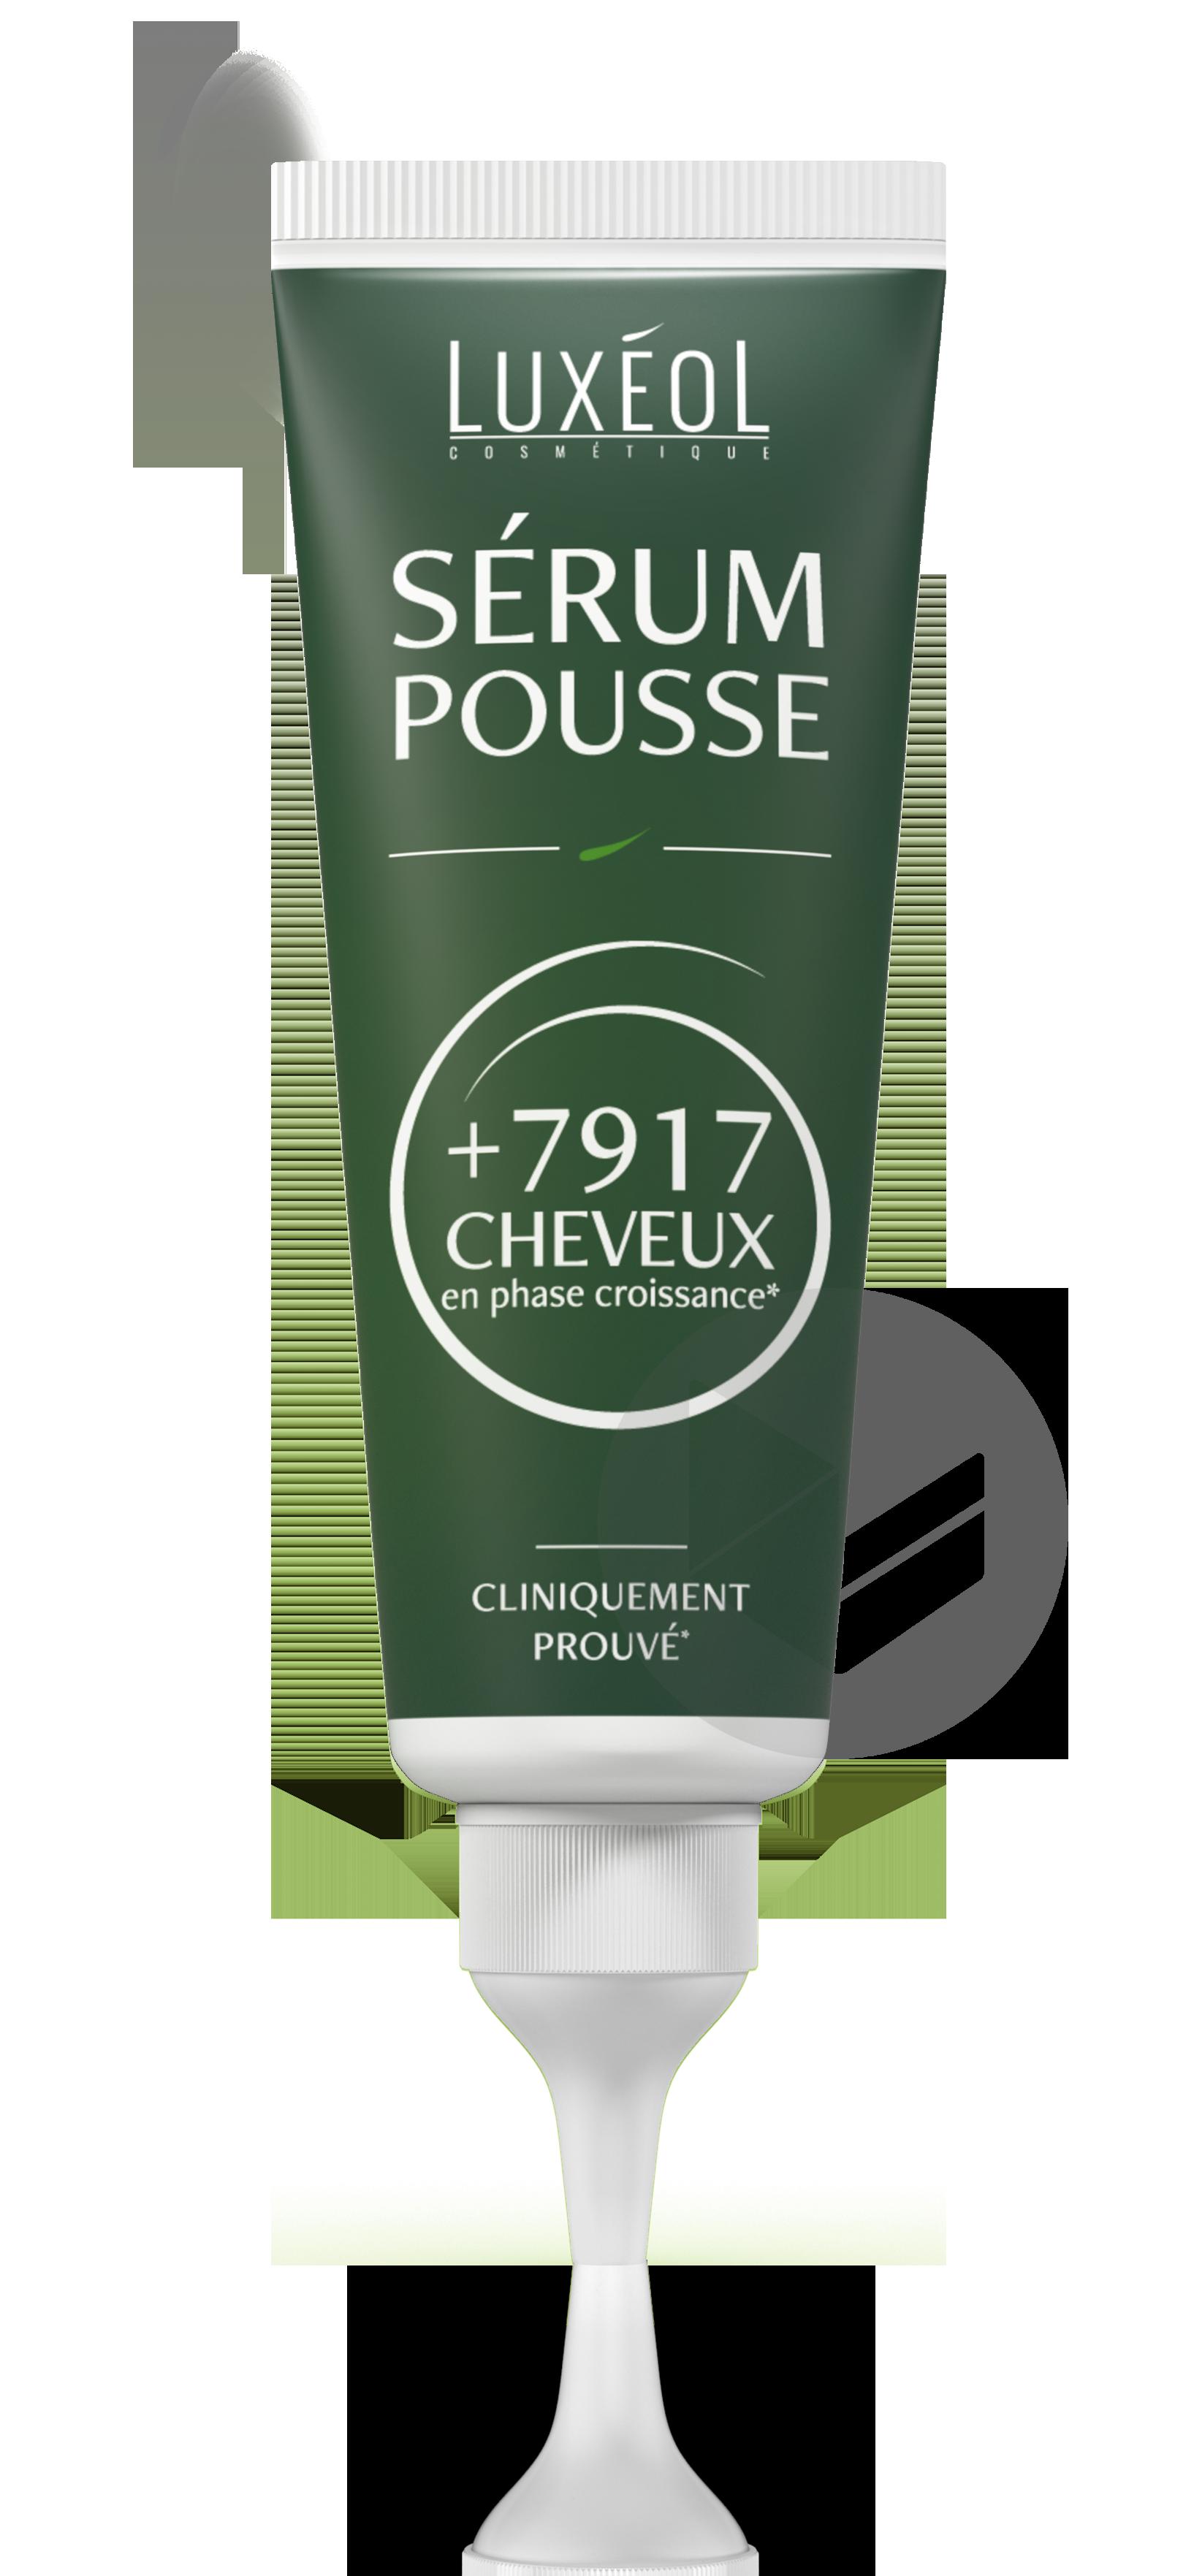 Luxeol Serum Pousse